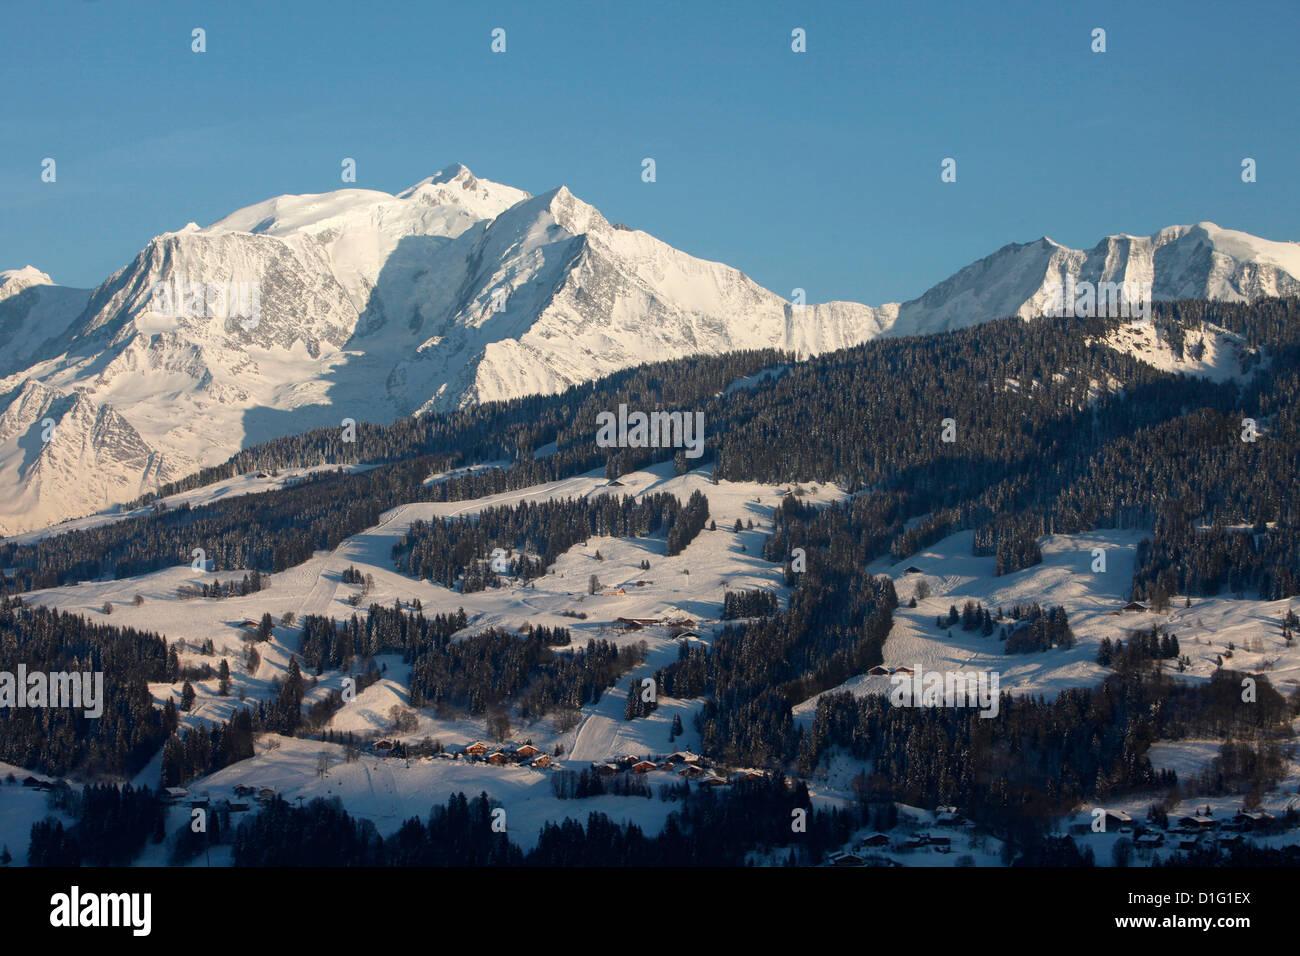 Megeve ski slopes, Mont-Blanc mountain range, Megeve, Haute-Savoie, French Alps, France, Europe - Stock Image